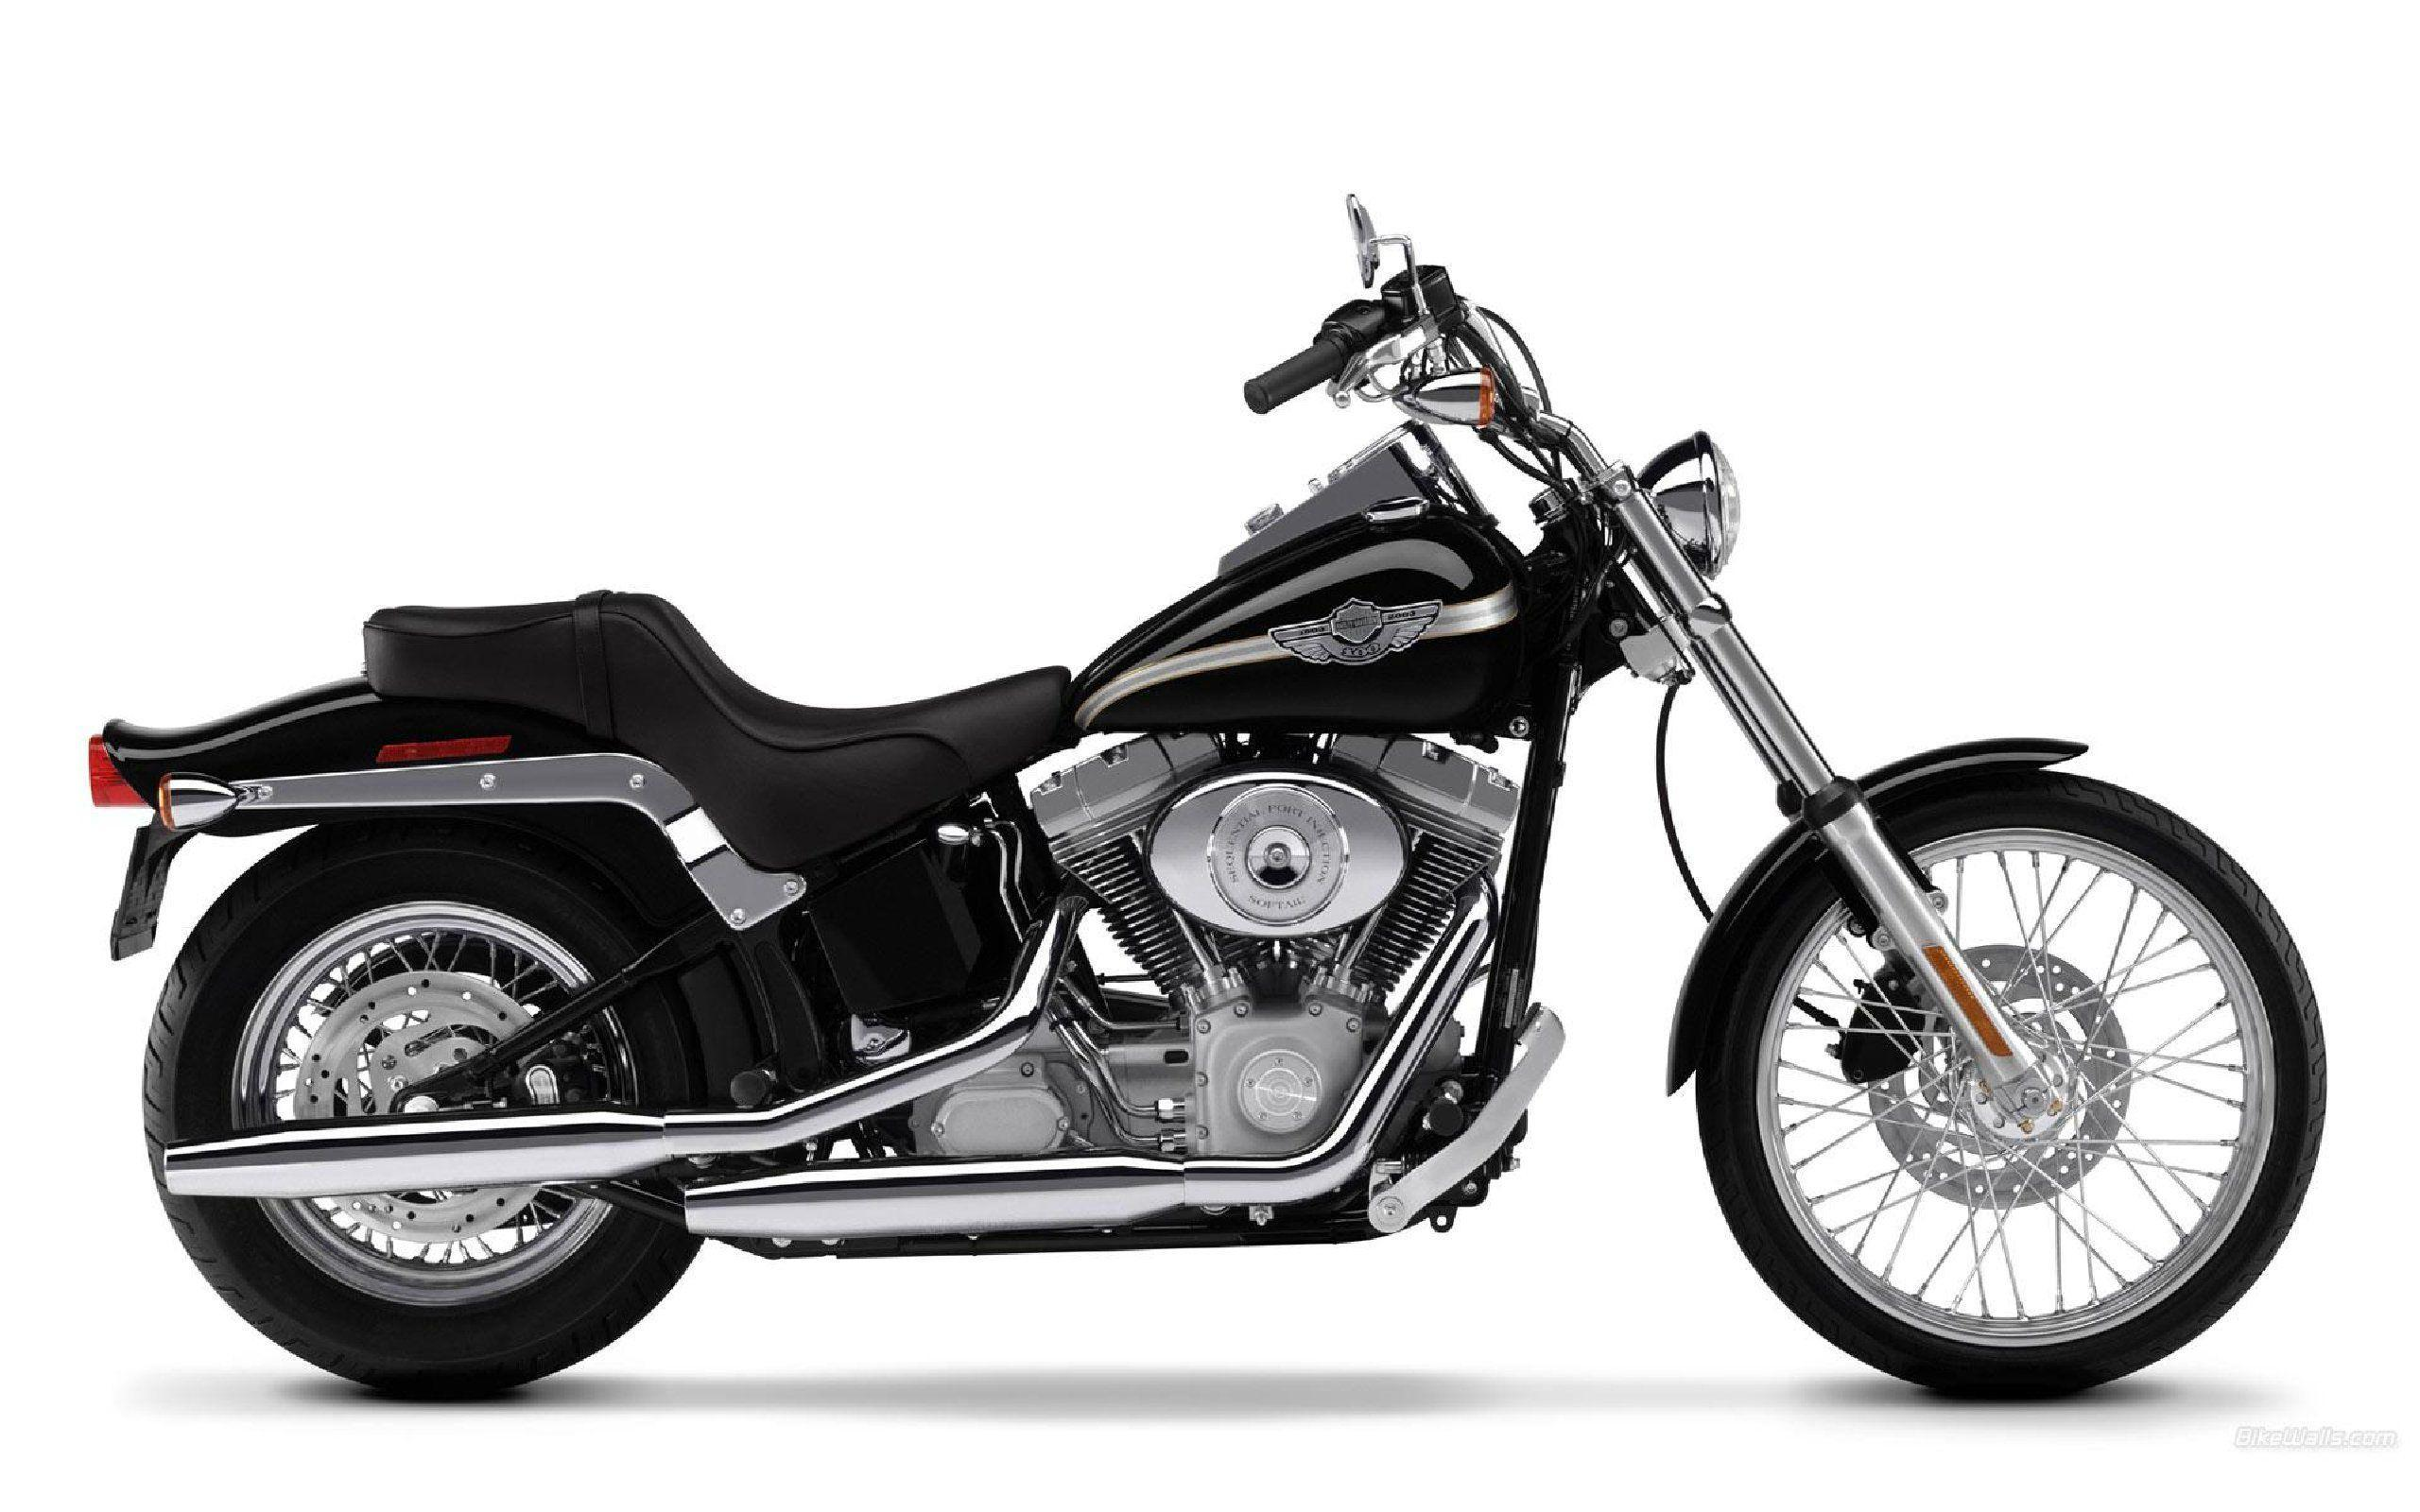 Harley-Davidson Sportster Wallpapers - Wallpaper Cave